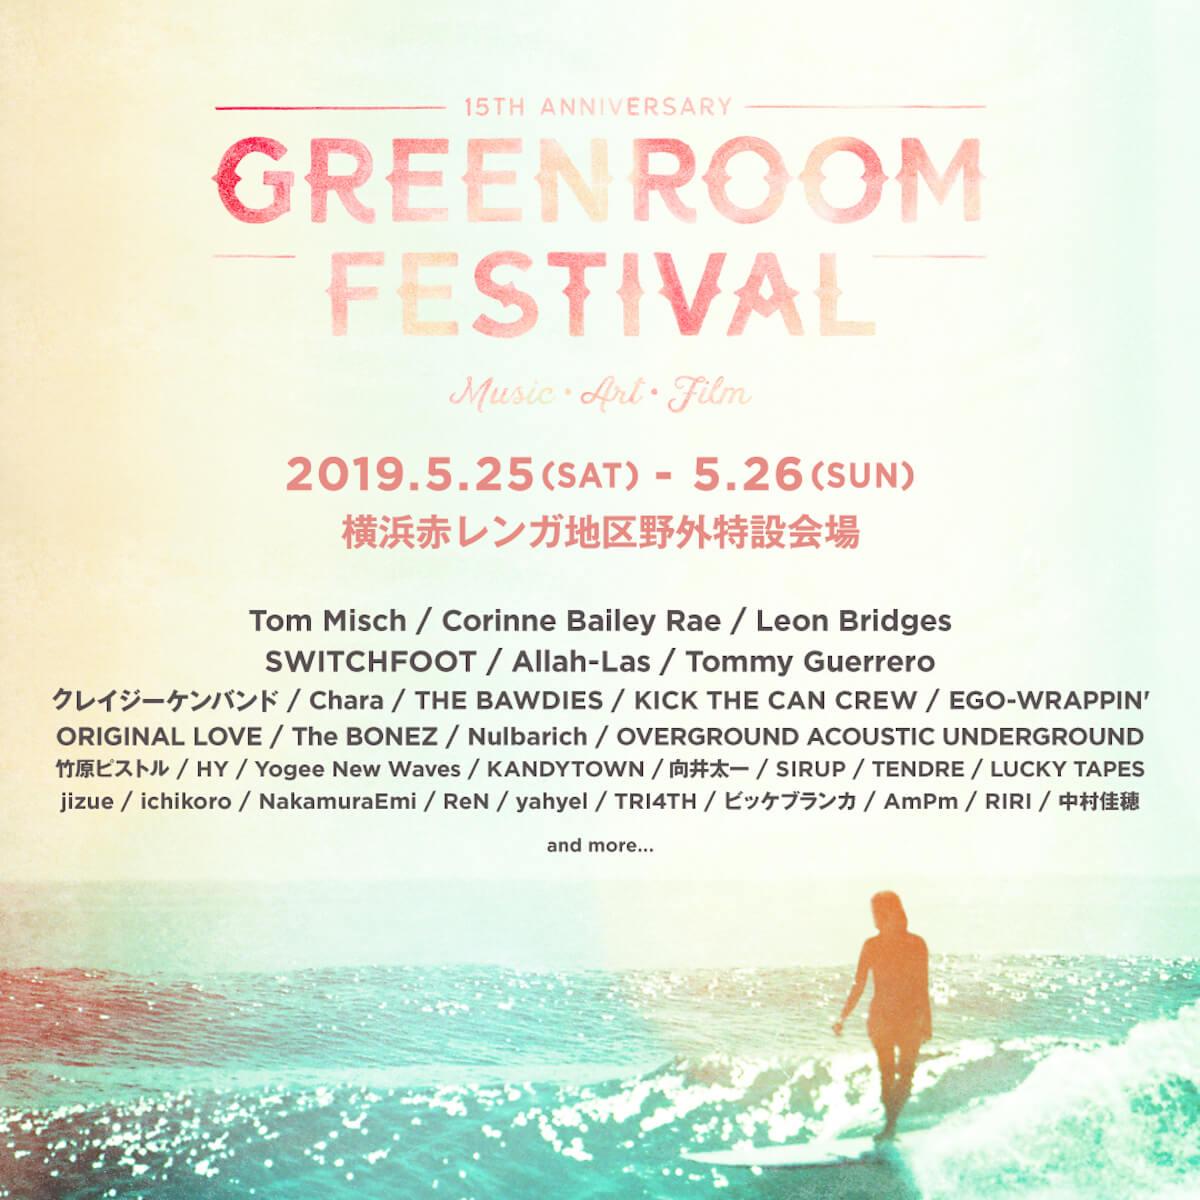 「GREENROOM FESTIVAL'19」第二弾発表でLeon BridgesやORIGINAL LOVE、yahyel、KANDYTOWN、向井太一、中村佳穂ら music190214-greenroom-1